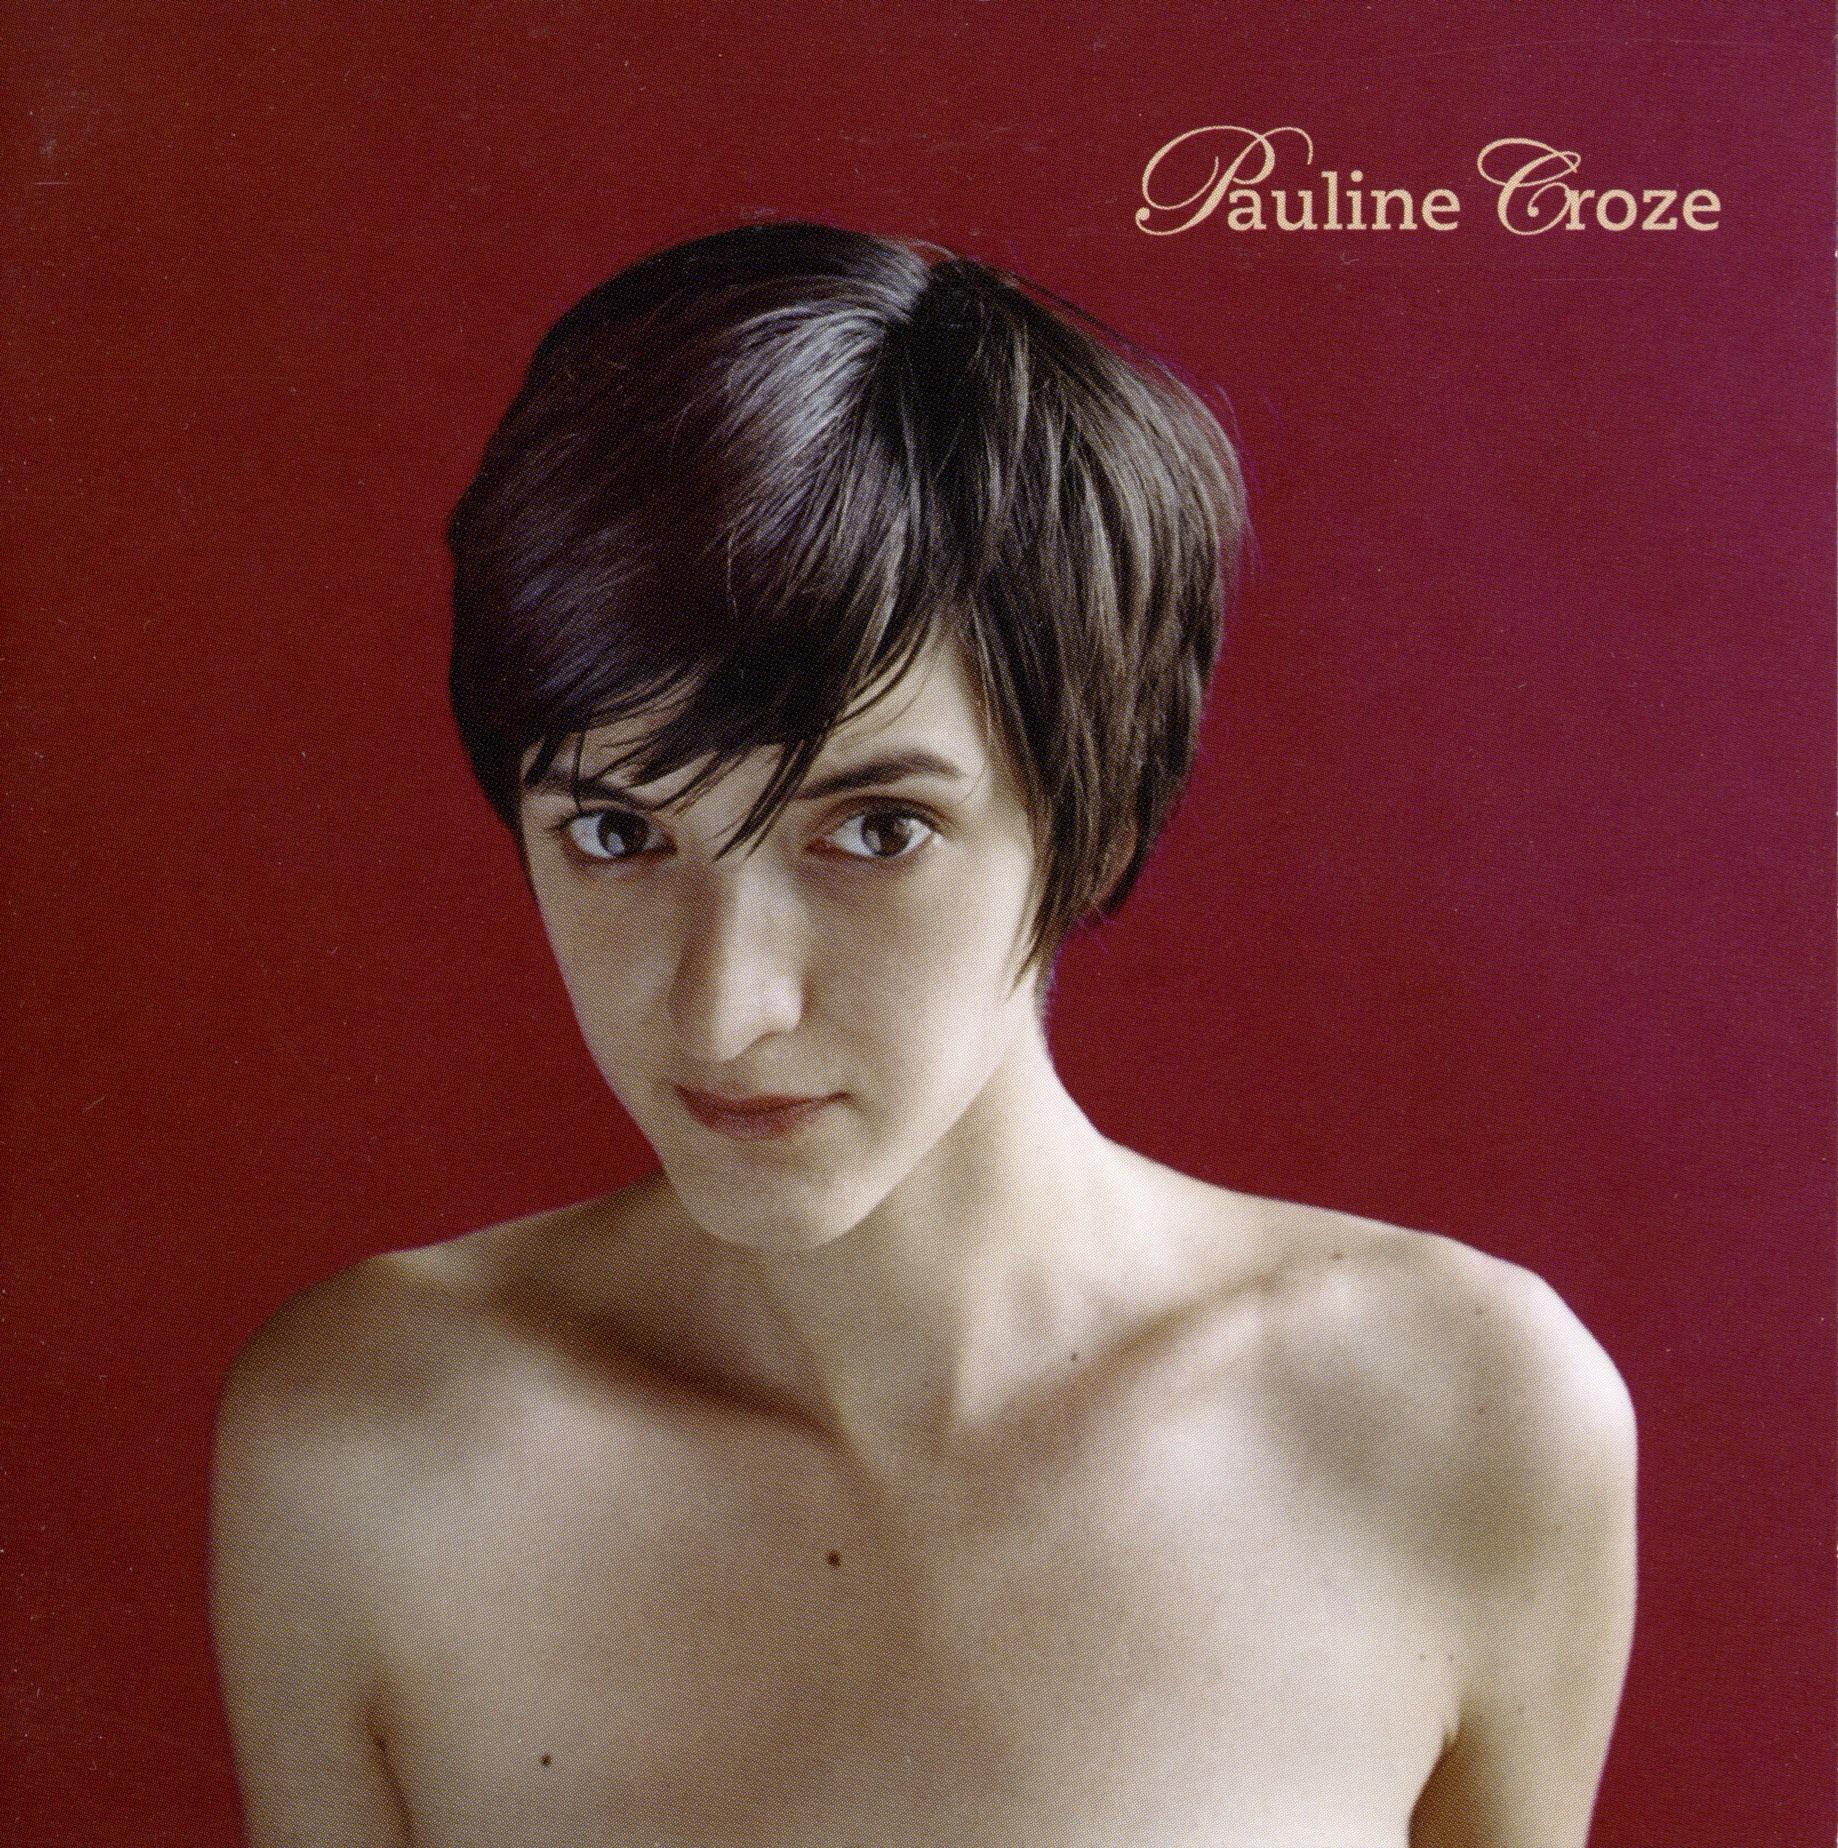 2003 - Pauline Croze